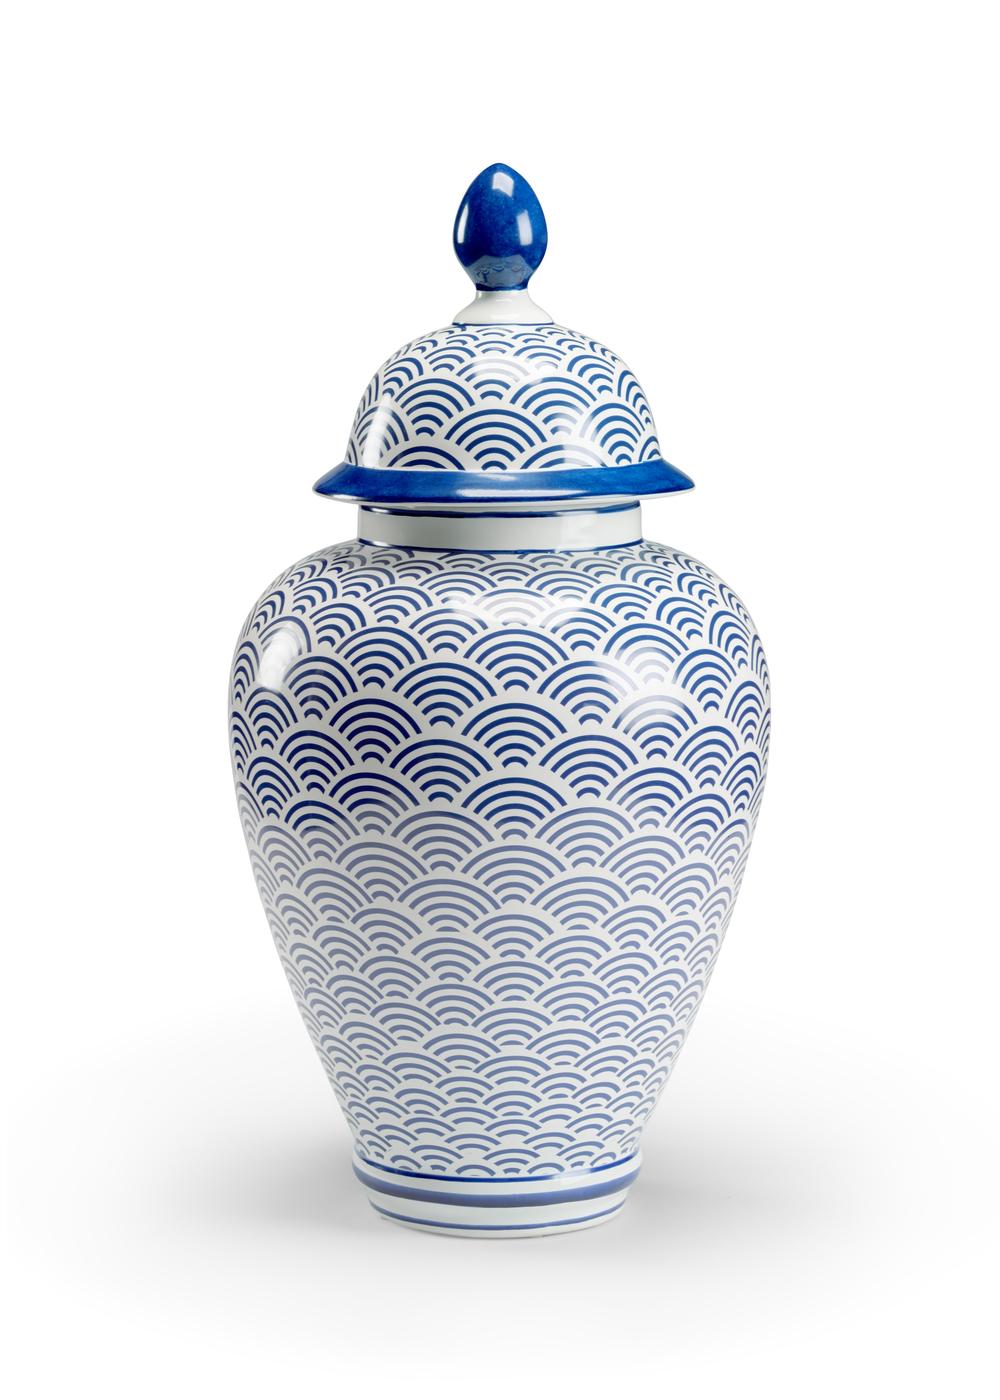 Chelsea House - Scale Vase